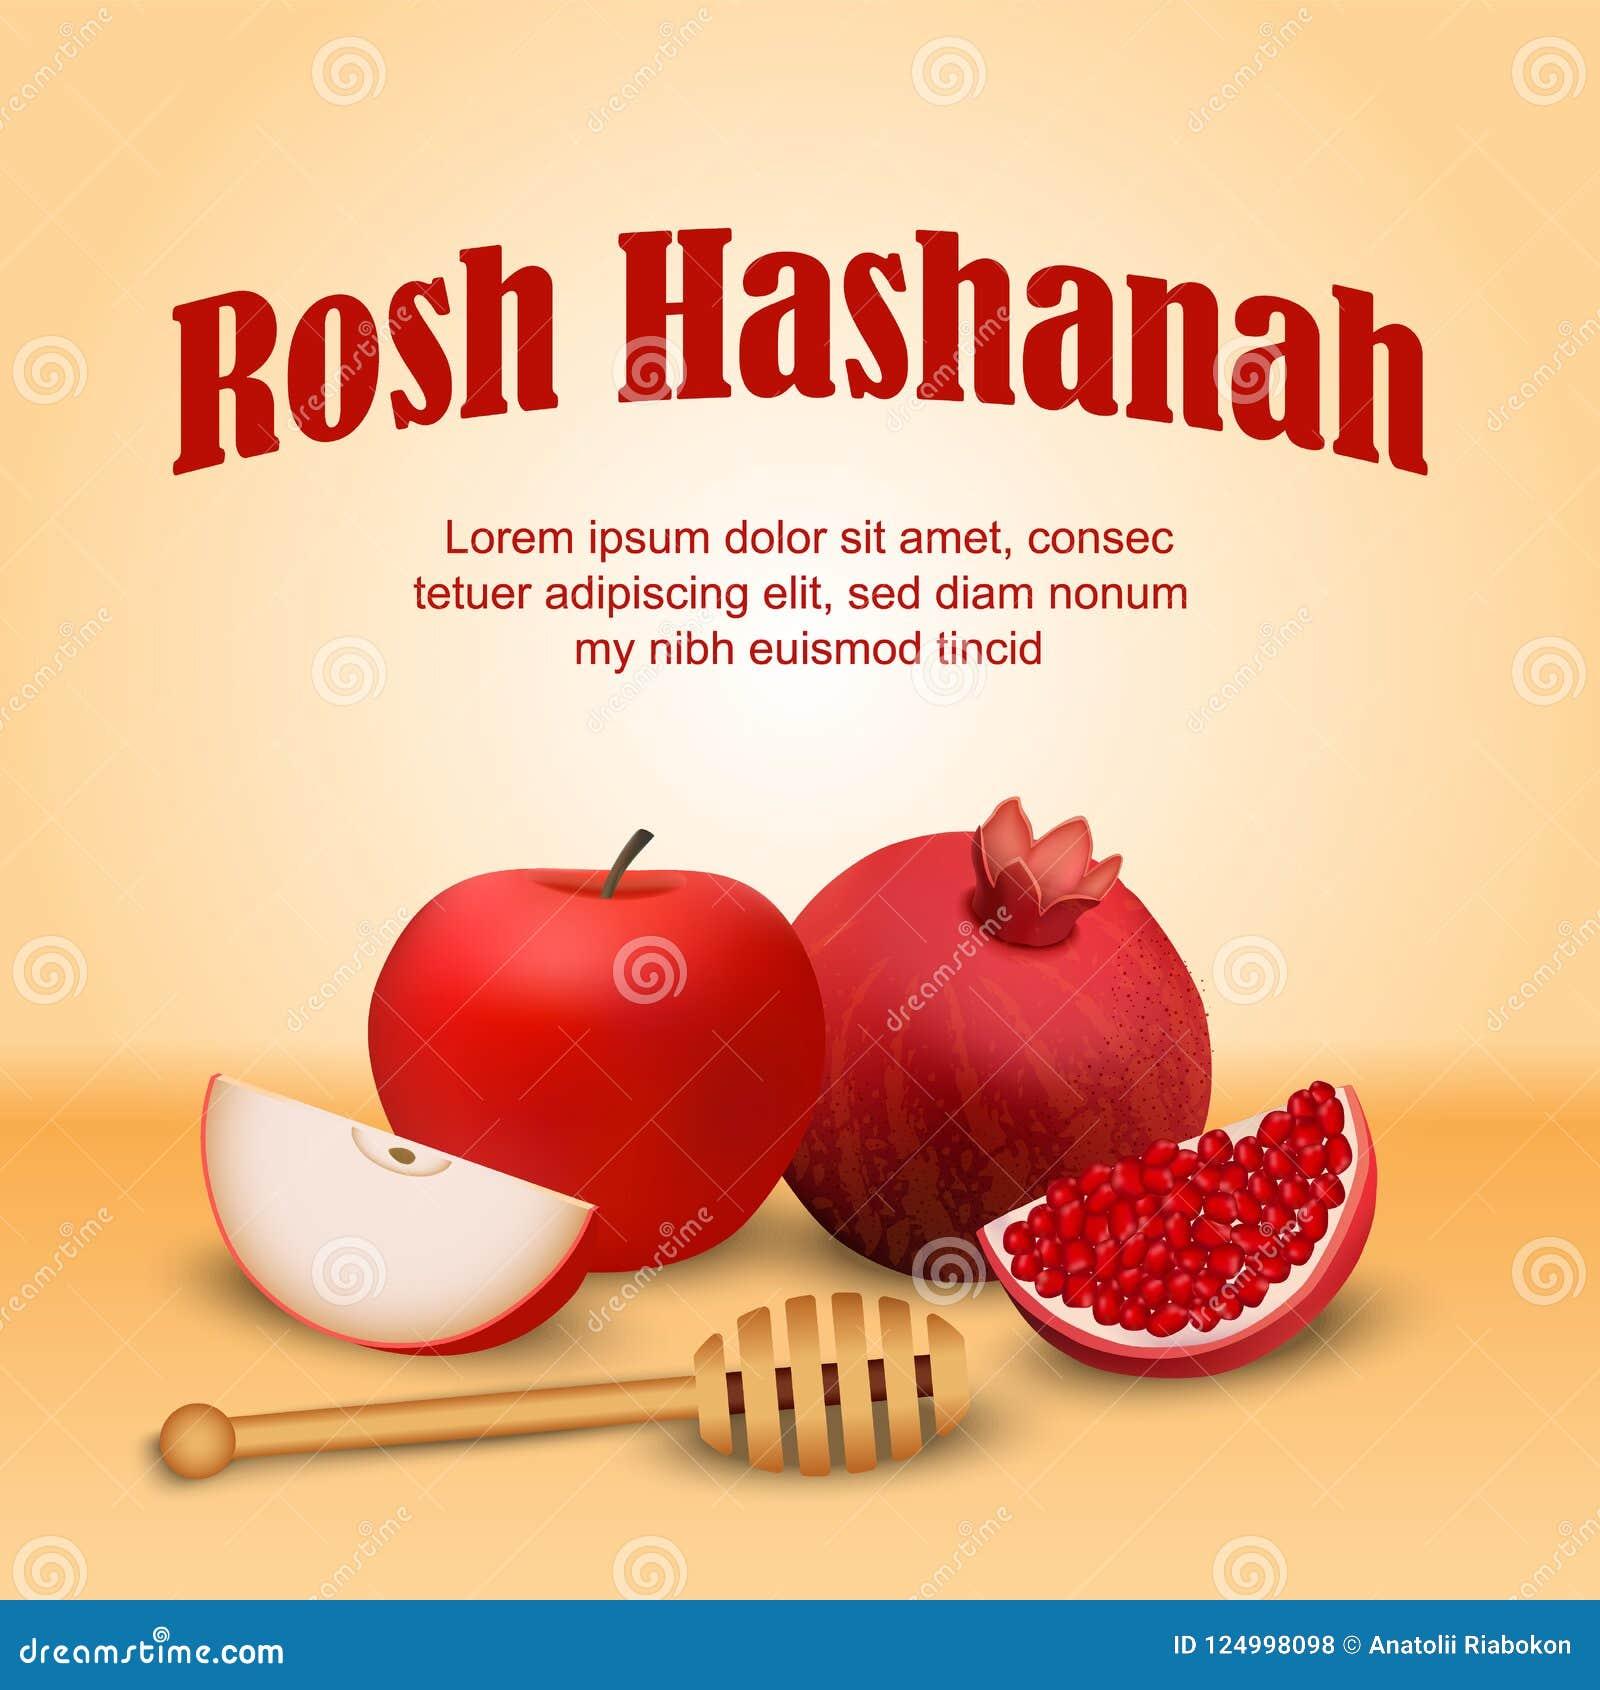 Rosh hashanah jewish holiday concept background, realistic style